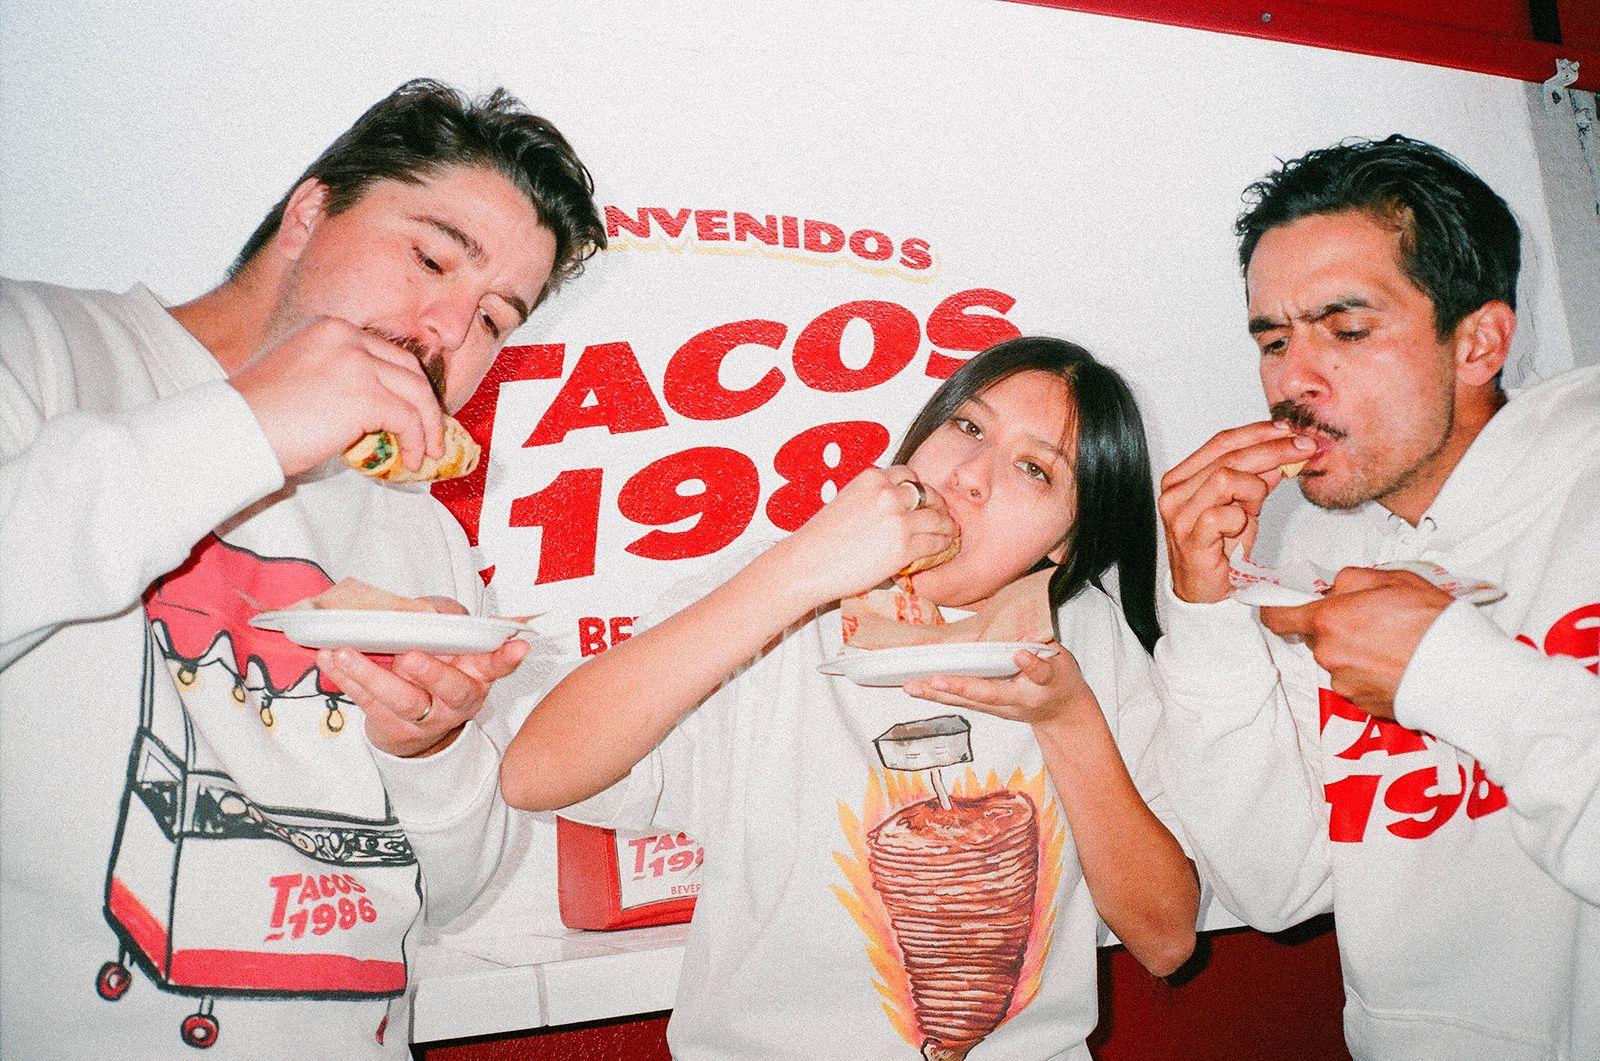 tacos-1986-x-hm-blank-staples-header